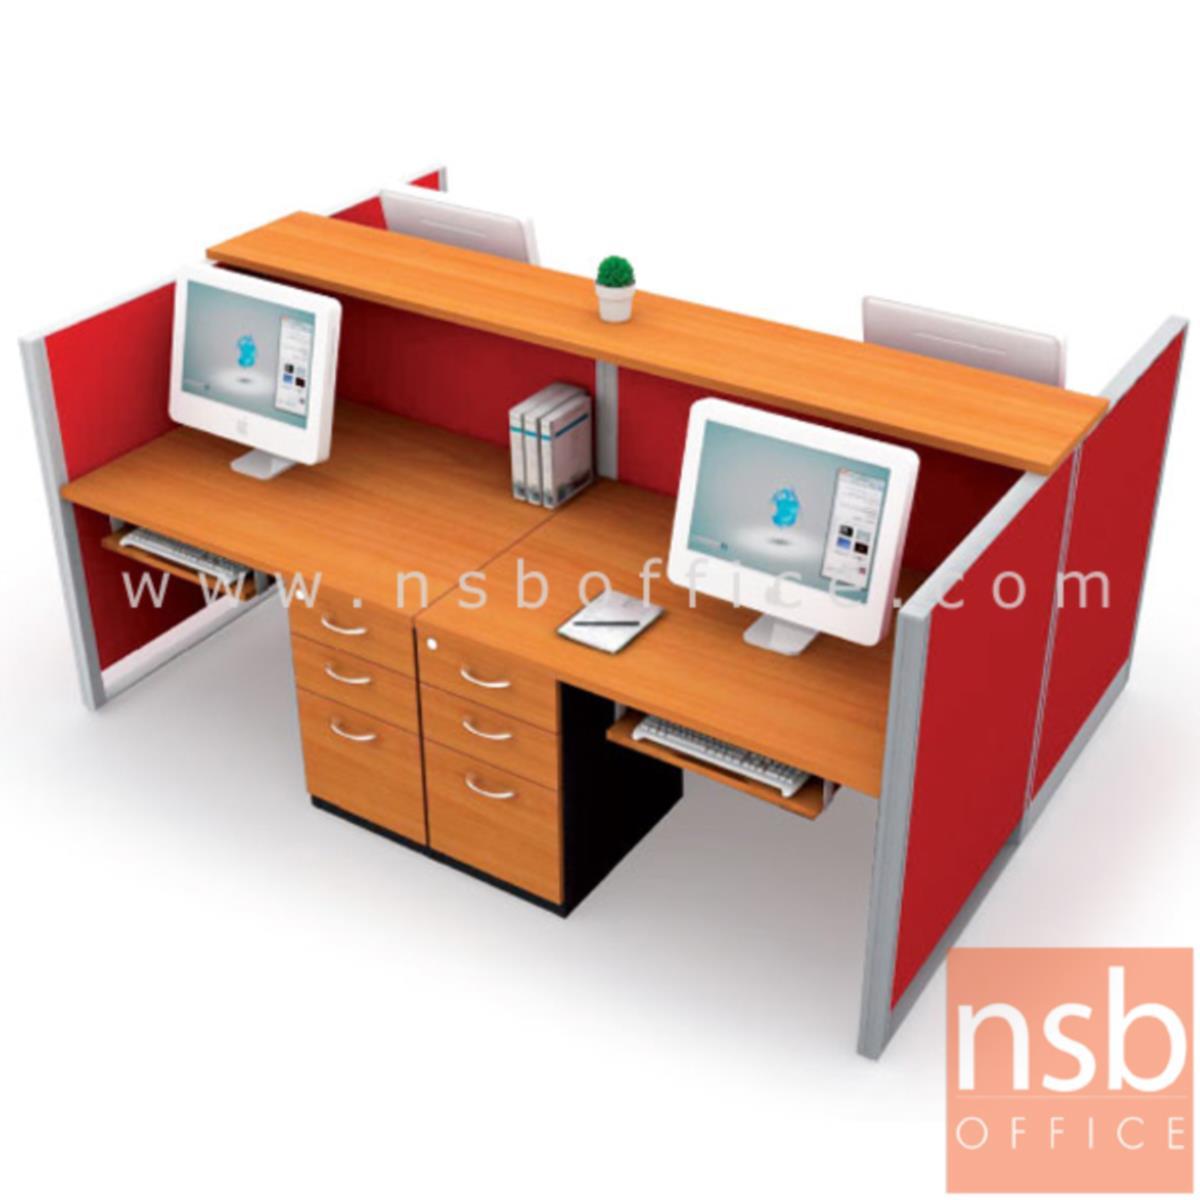 A04A037:ชุดโต๊ะทำงานกลุ่ม 4 ที่นั่ง   ขนาด 254W cm. พร้อมพาร์ทิชั่น Hybrid และลิ้นชักขาทึบ